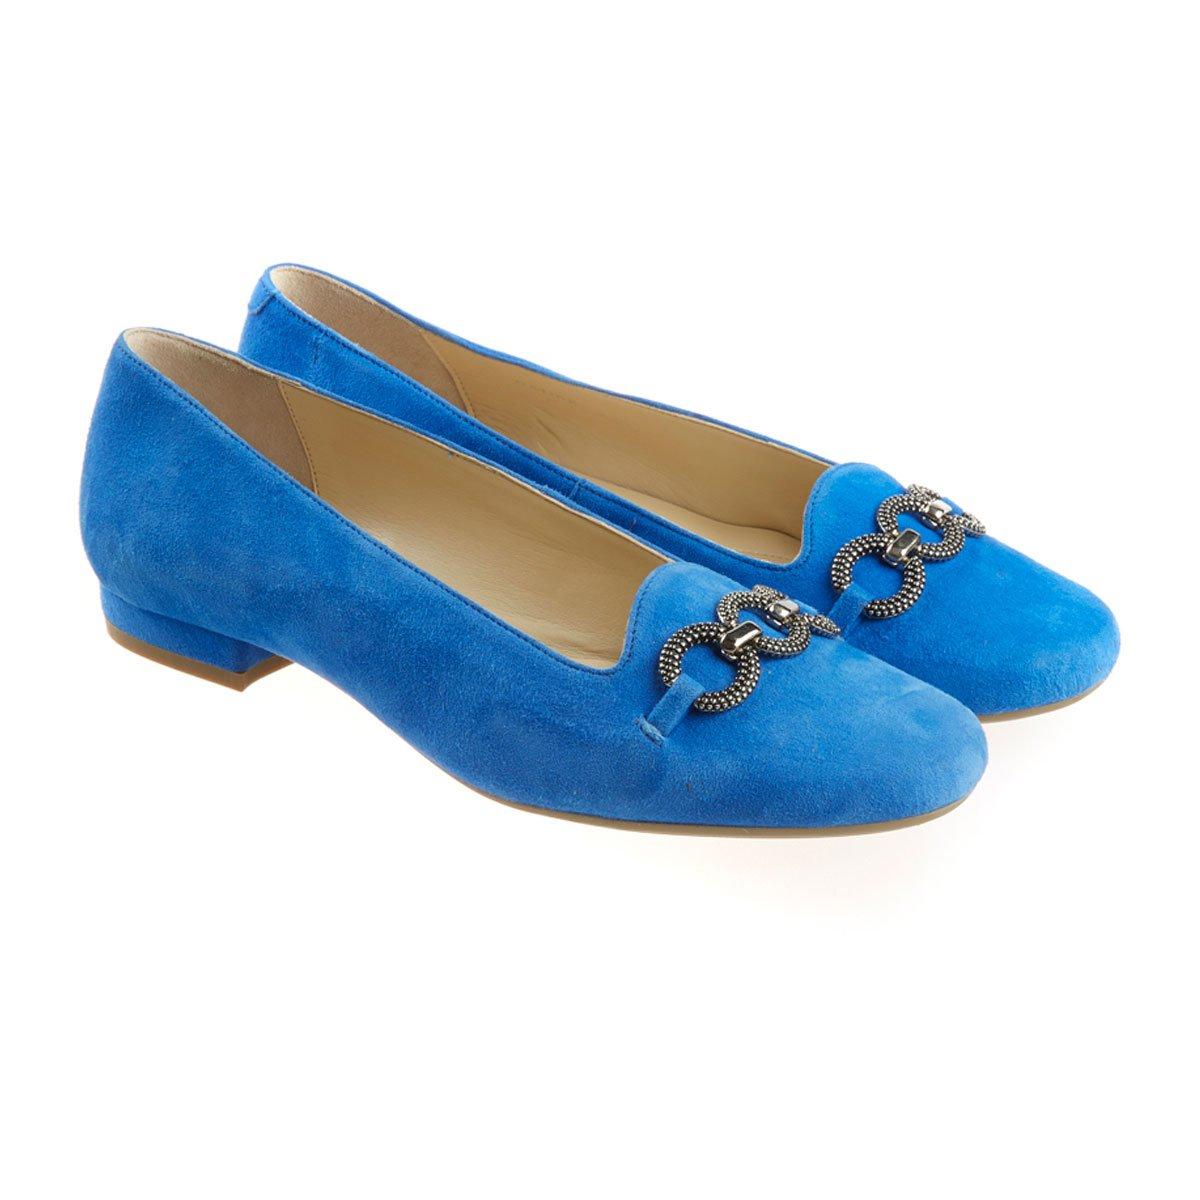 Van Dal Natick Damen Mokassins Mokassins Mokassins Blau Kobaltblau bc32c6